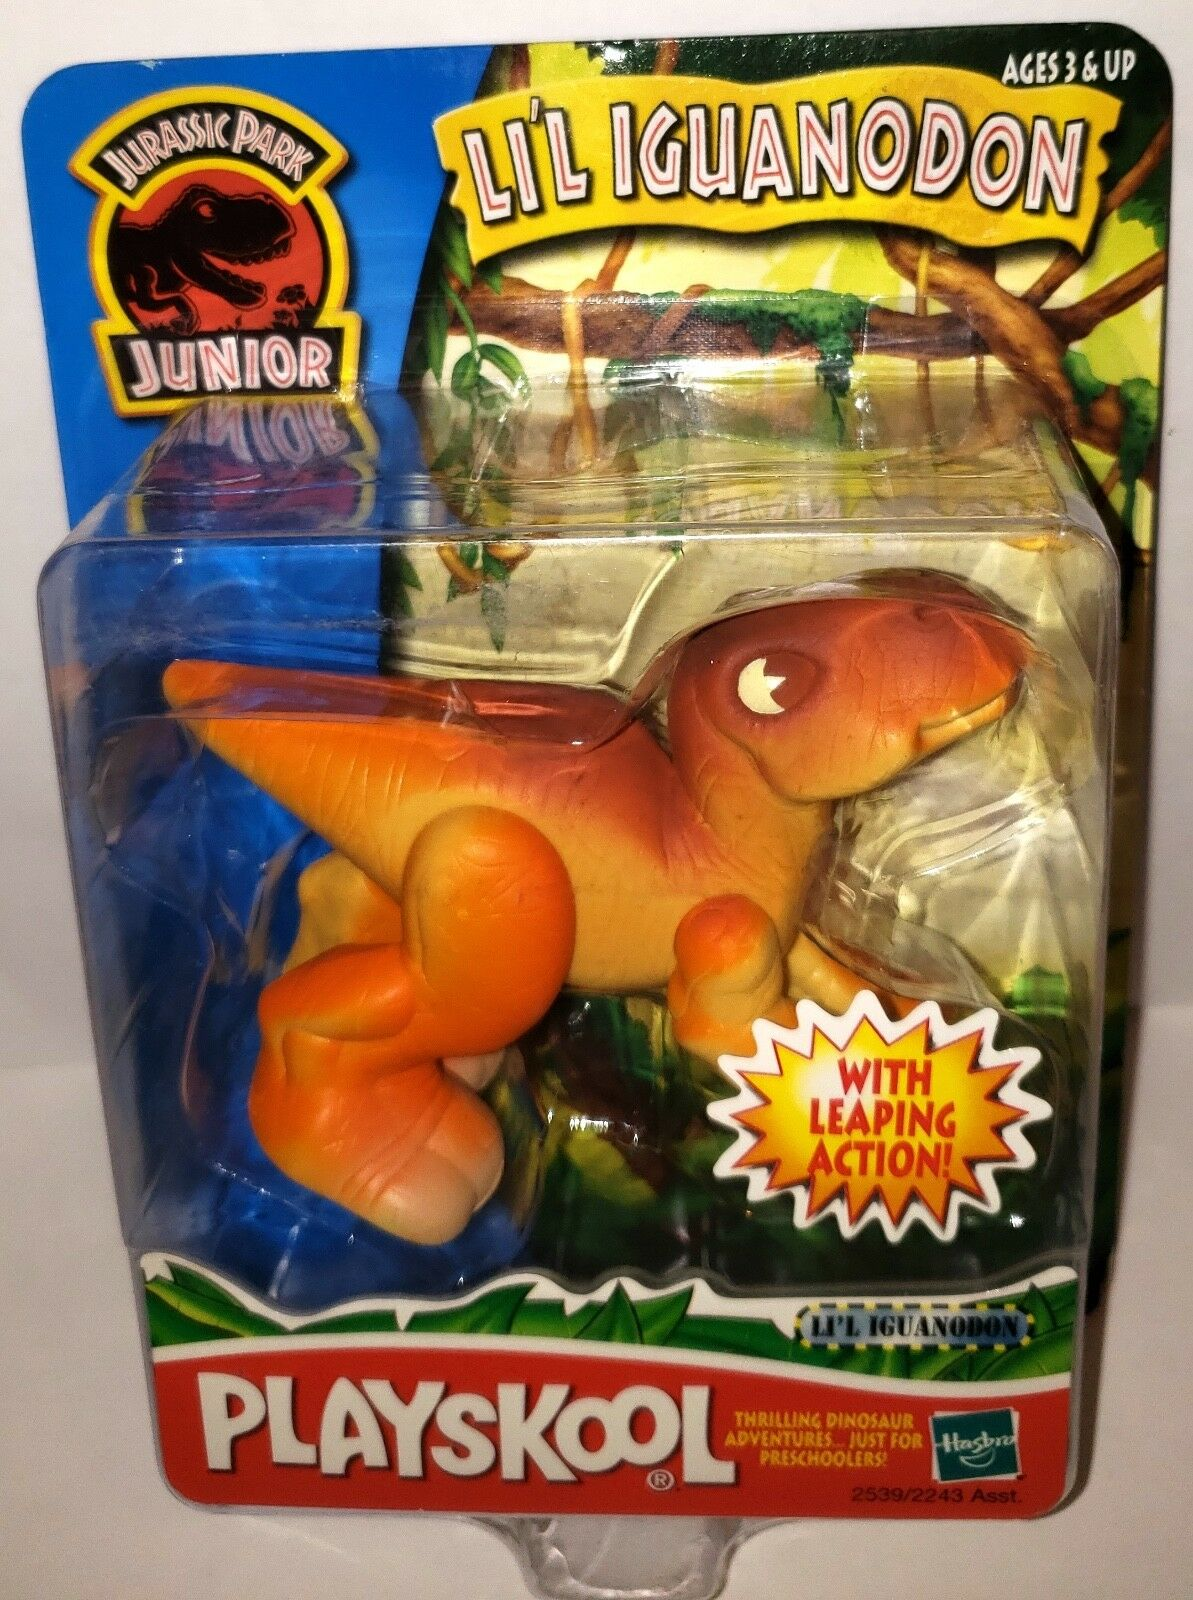 (neu) jurassic park junior jr. playskool werden iguanodons dinosaurier - spielzeug